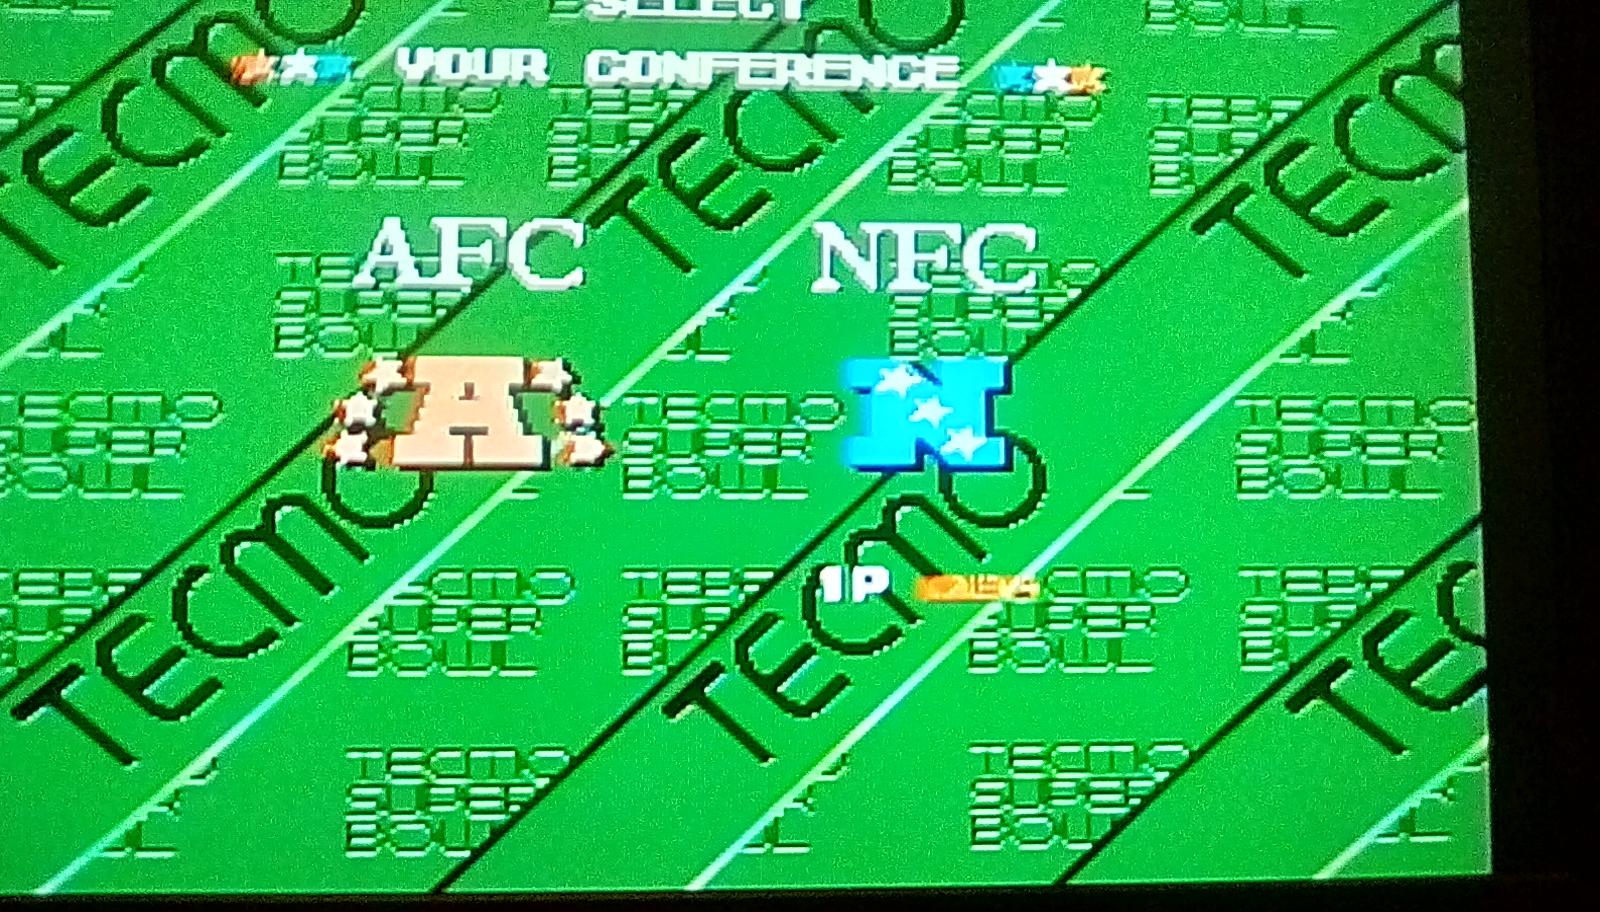 Tecmo Super Bowl [Most Total Yards] [Pro Bowl] 574 points